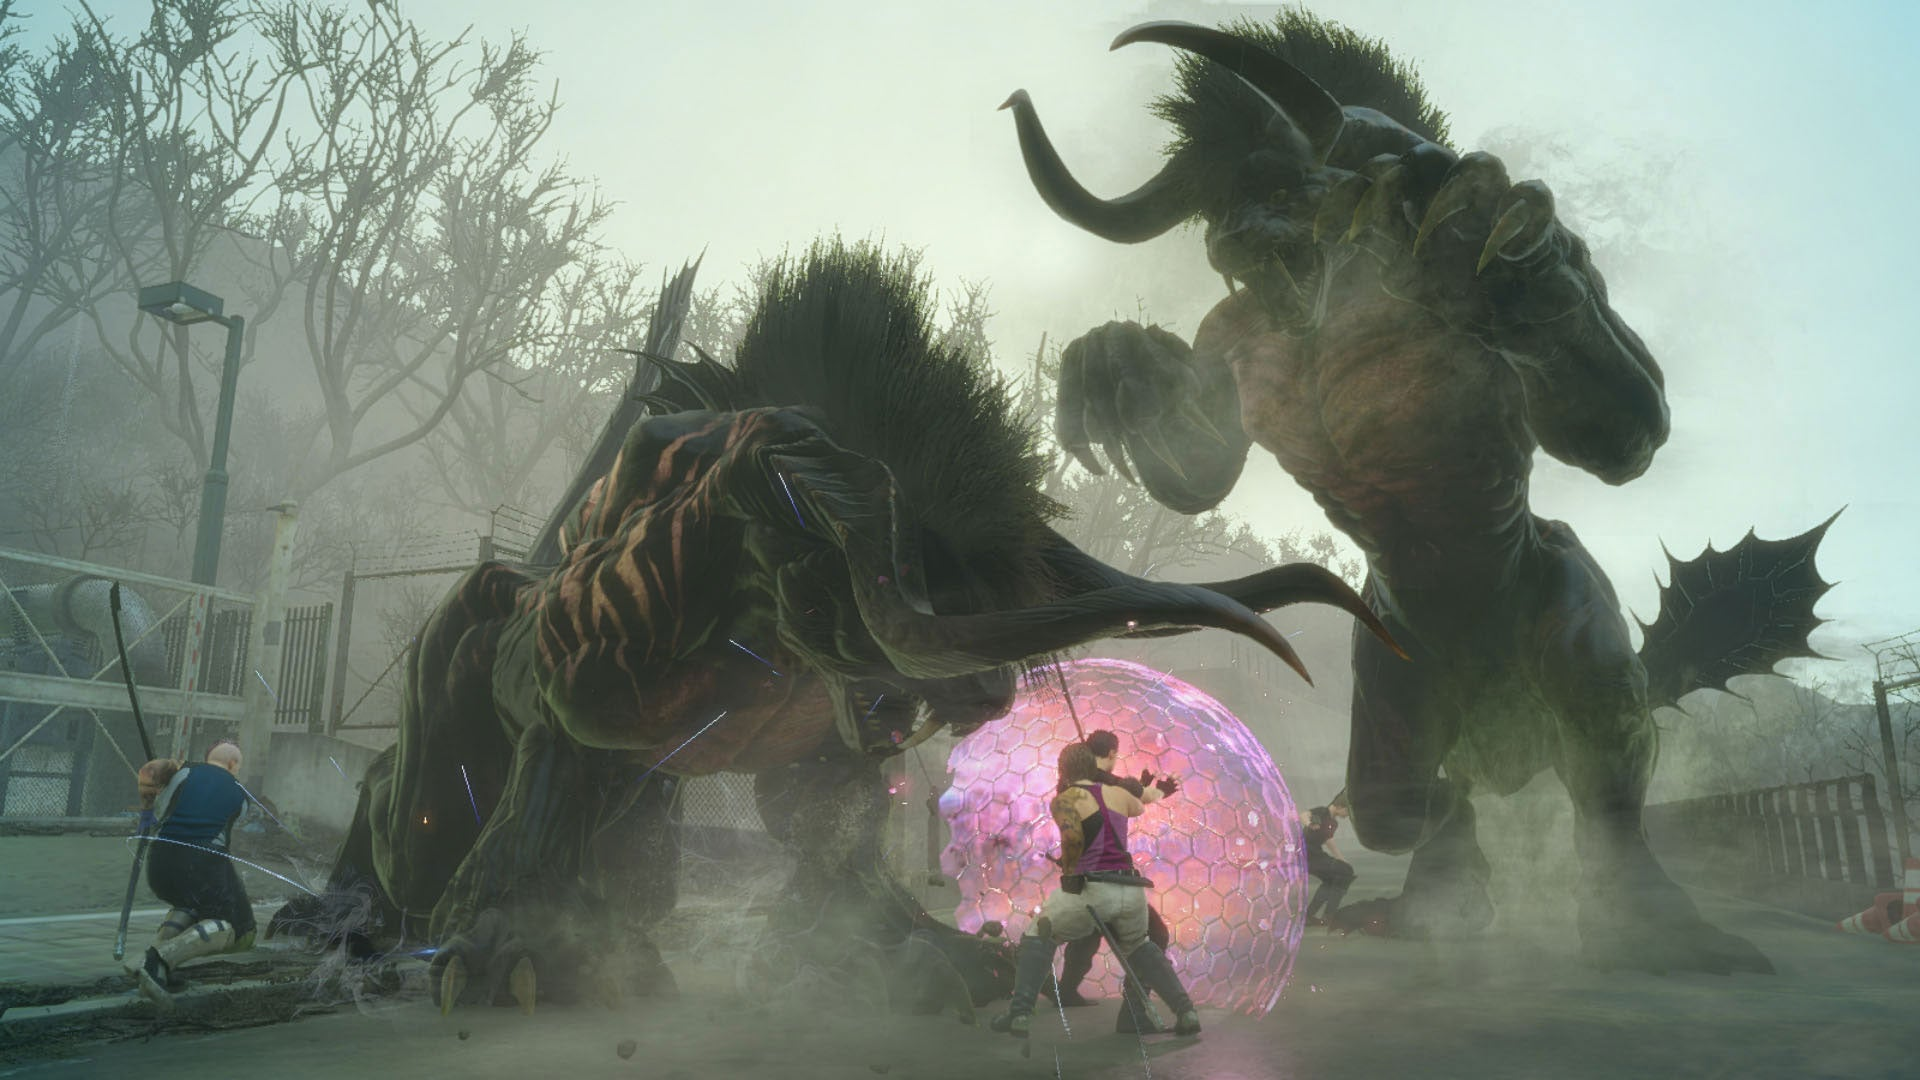 'Final Fantasy XV' DLC: Square Enix announce multiplayer expansion details